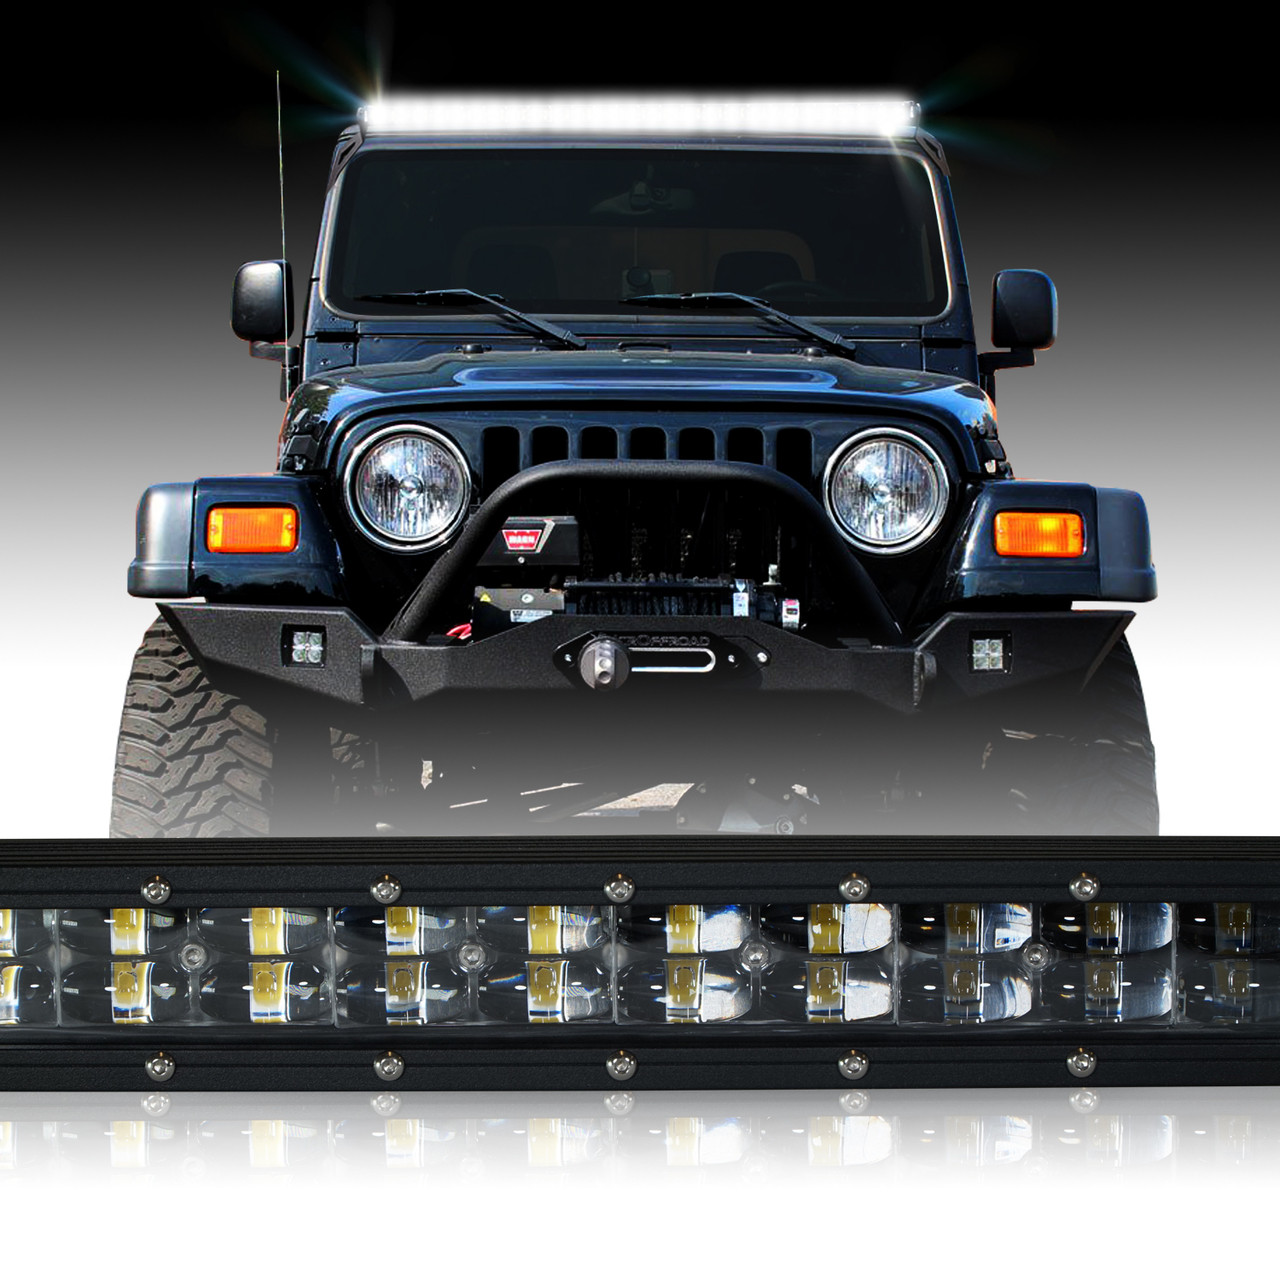 2006 jeep wrangler wiring harness wiring diagram 1999 jeep wrangler heater wiring harness 2000 jeep wrangler [ 1280 x 1280 Pixel ]